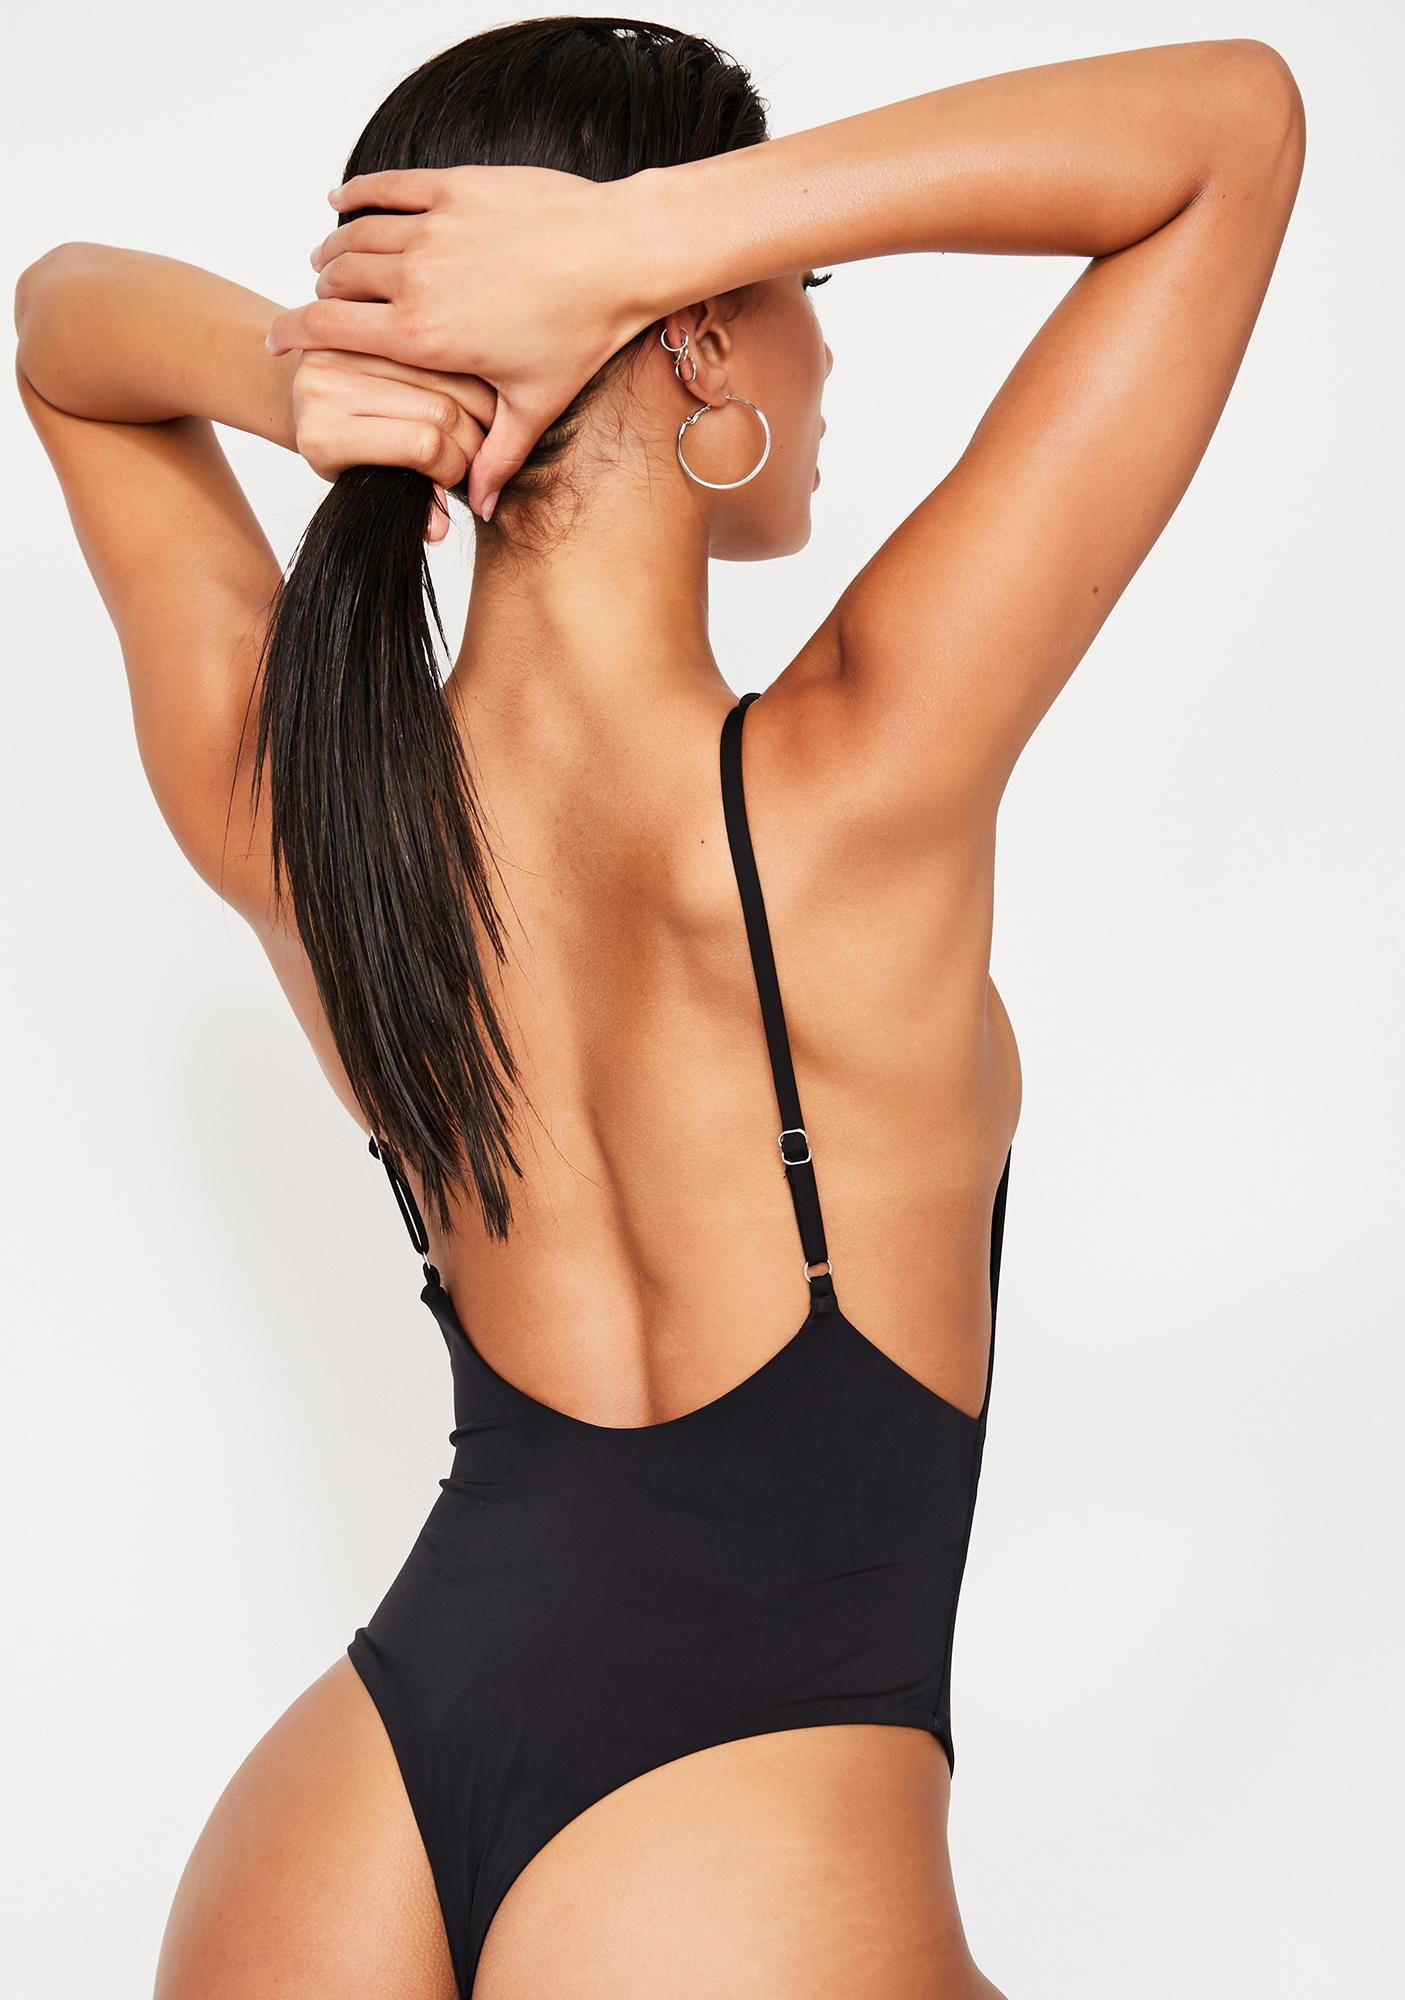 6efa878356d9 Dippin' Daisy's Low Back Thong One Piece Bikini | Dolls Kill